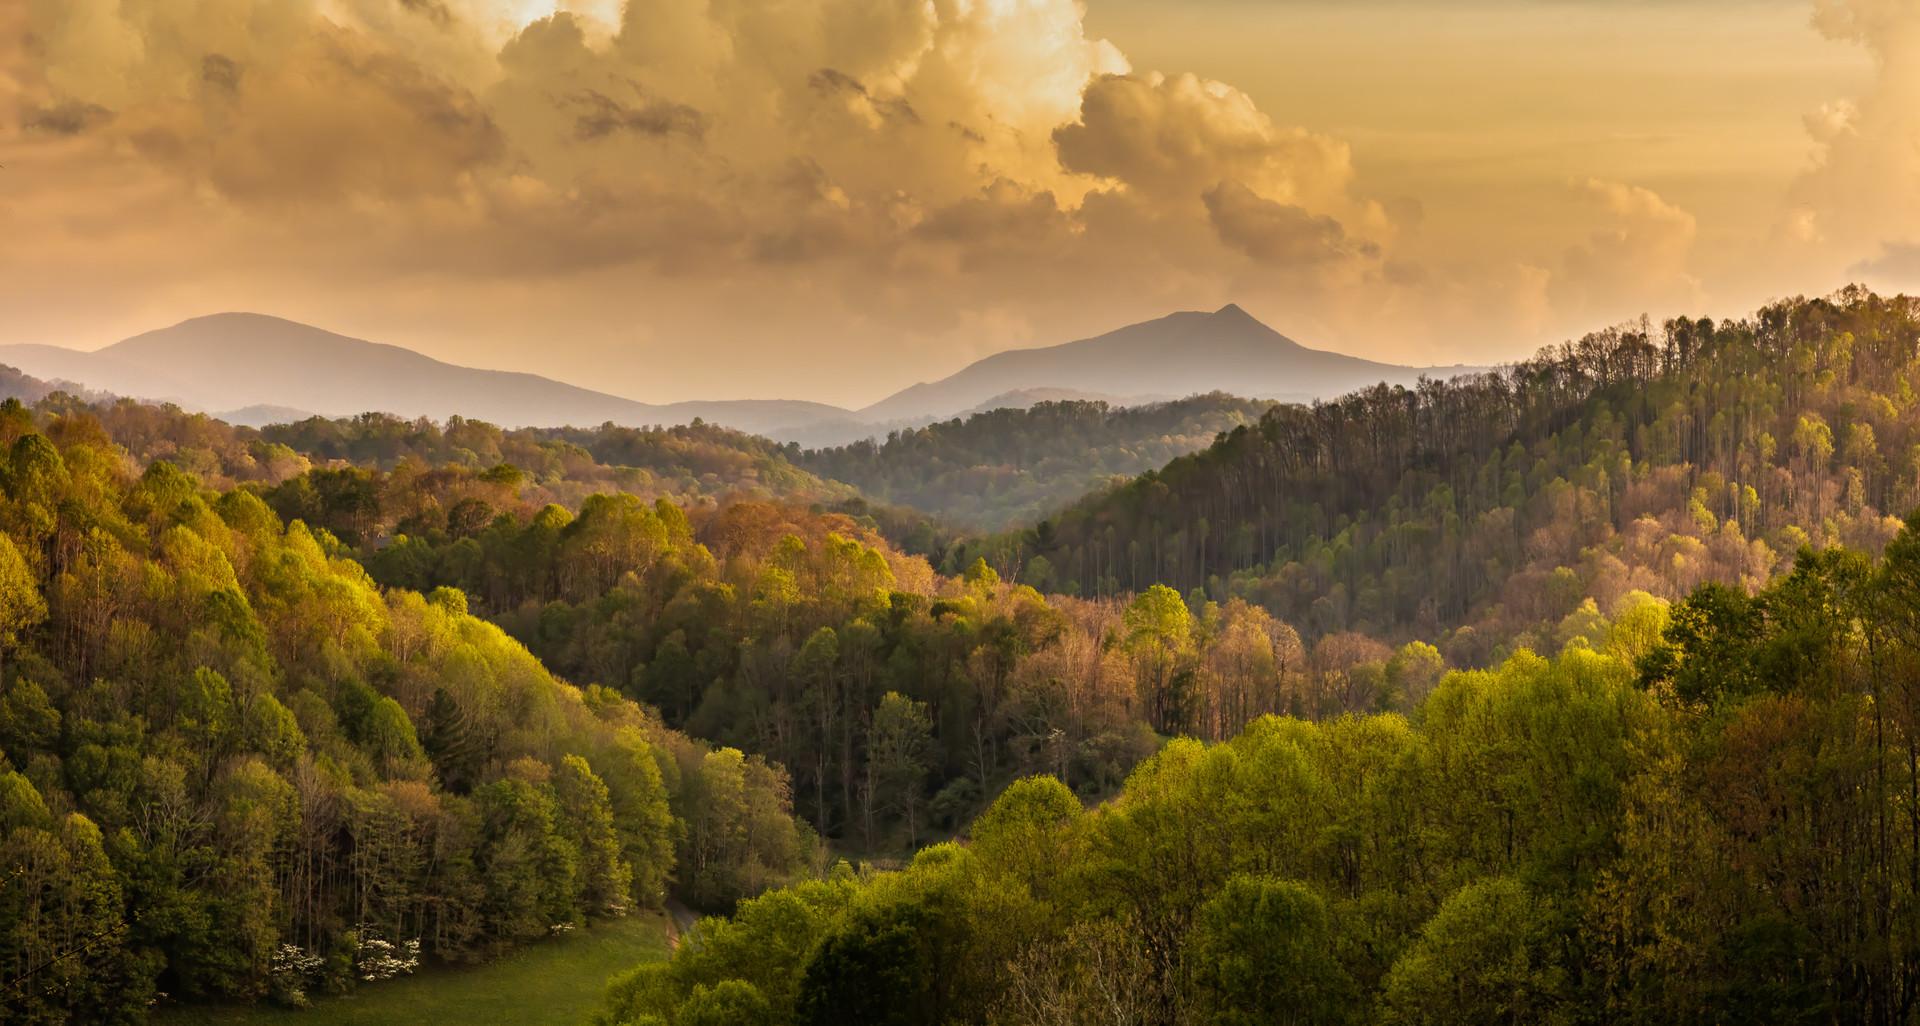 Valley of Morning Light - Creston, NC